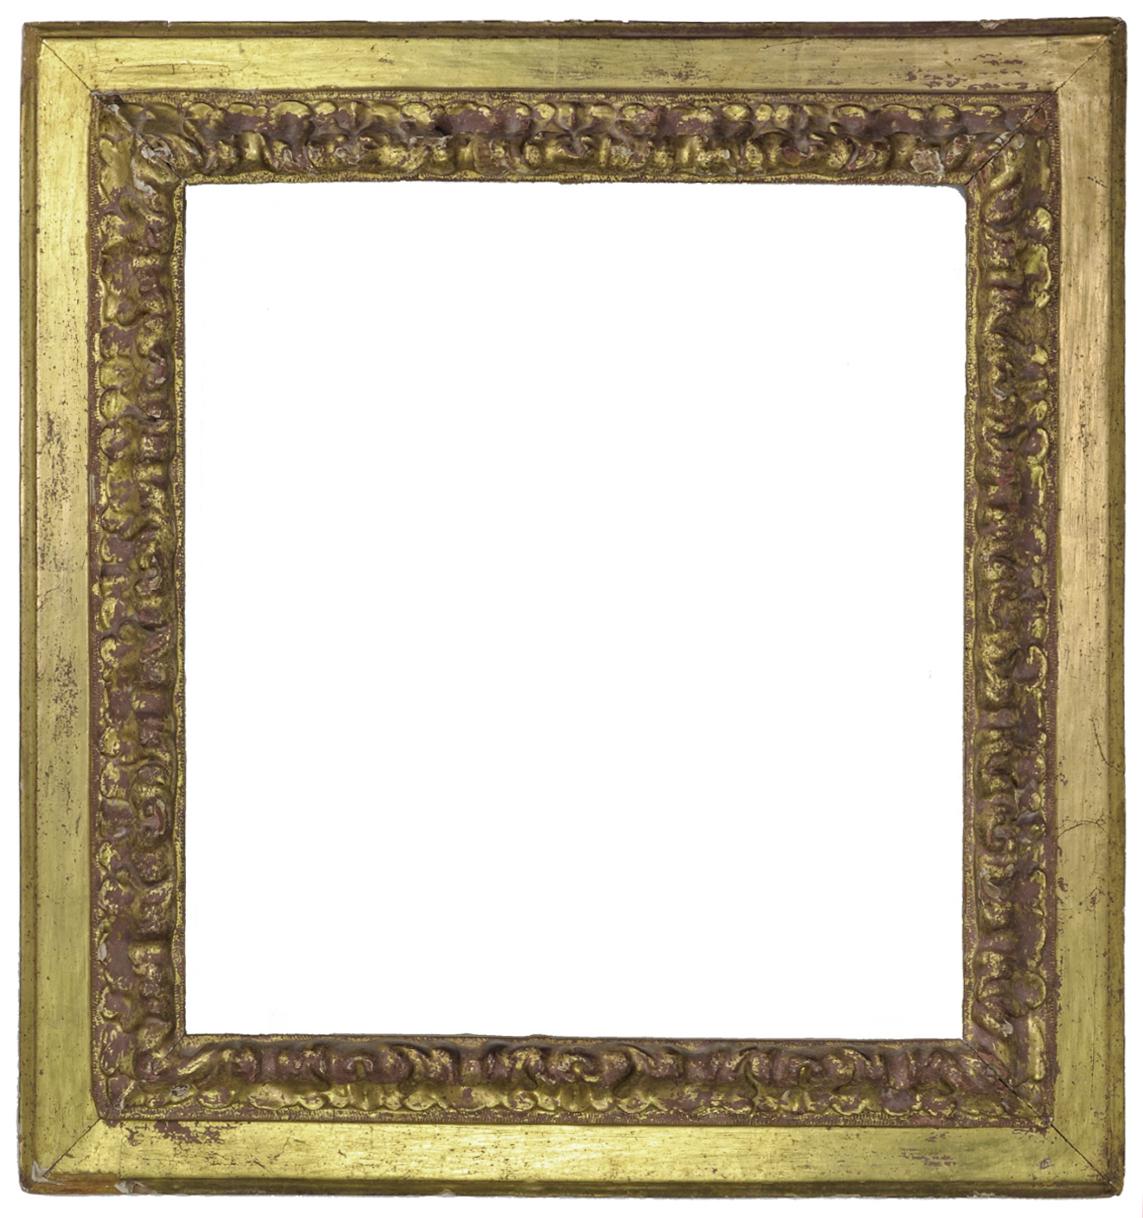 Conzen 14th Antique Frame Auction 2017 | The Frame Blog